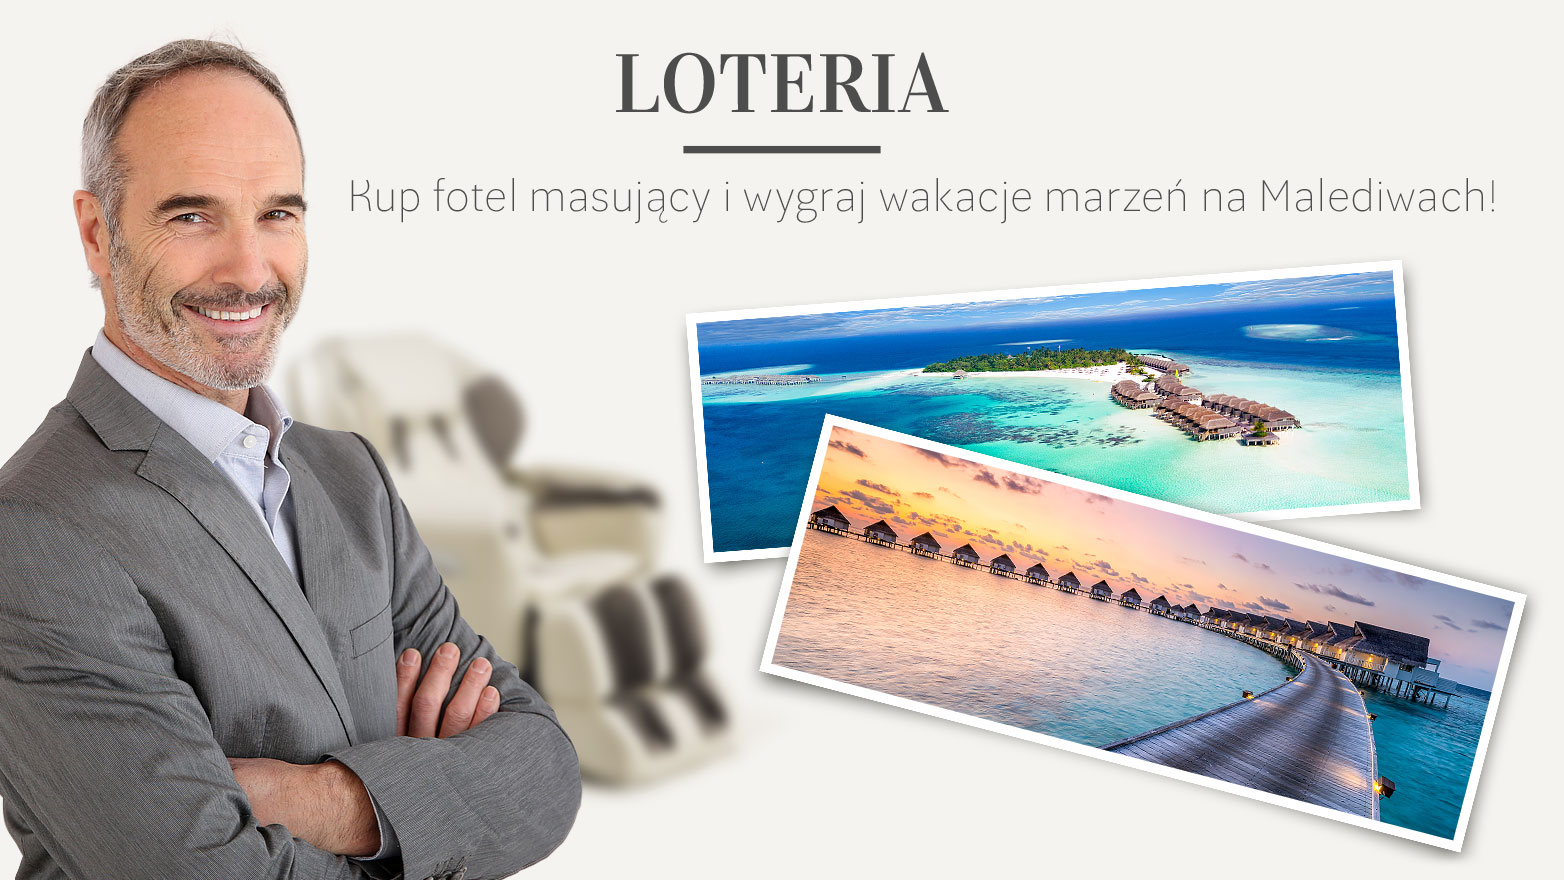 Loteria Malediwy z Rest Lords